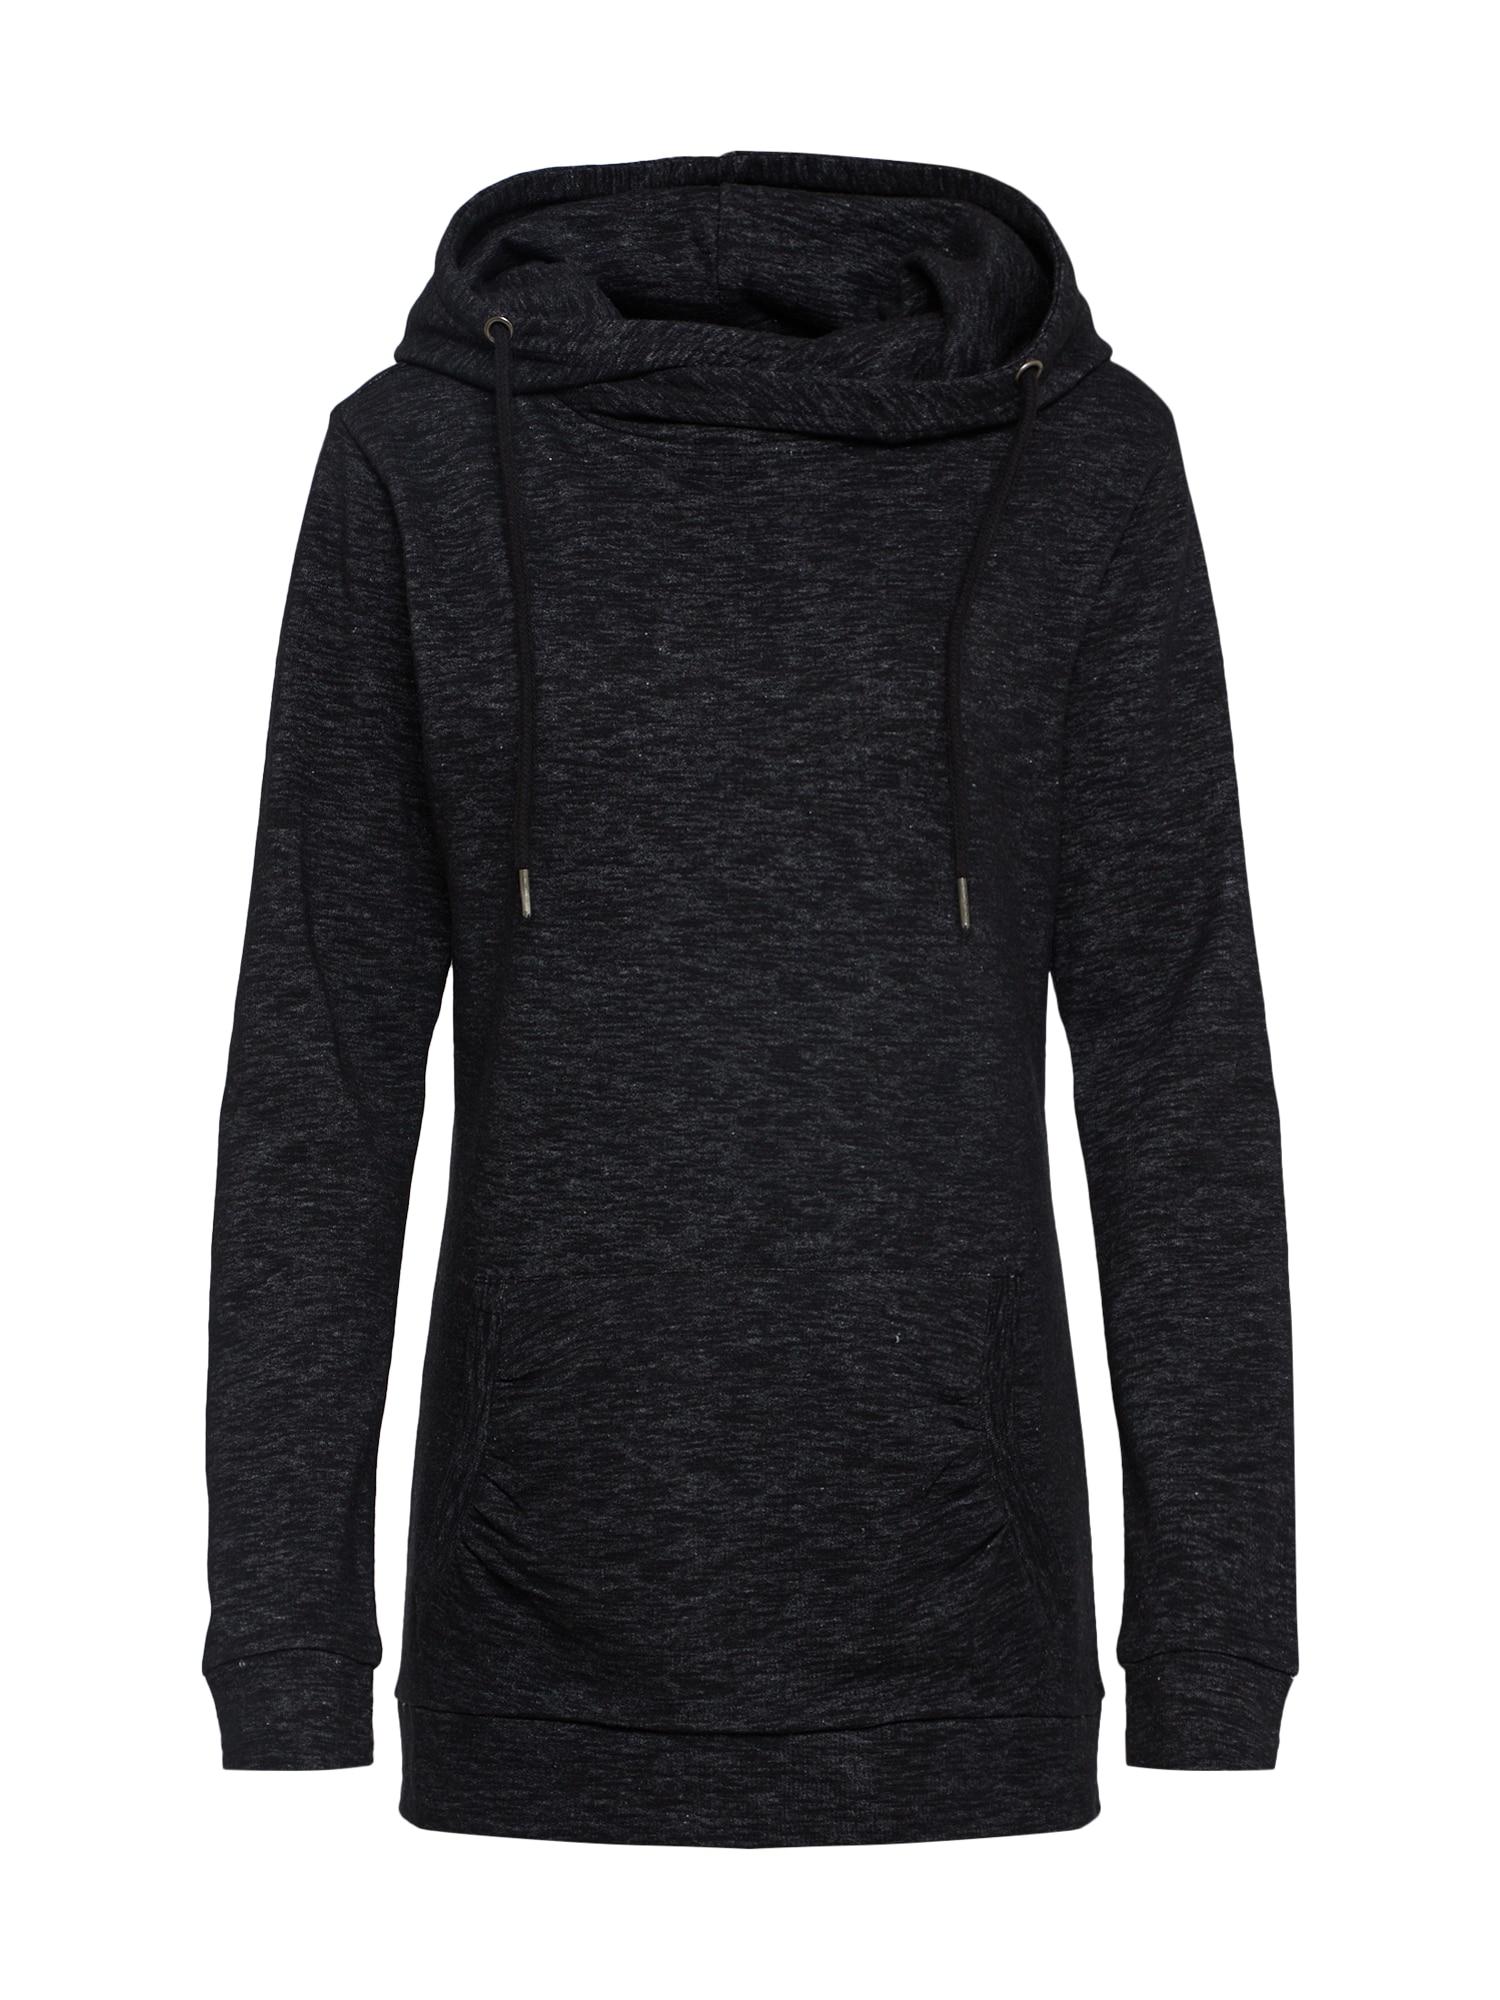 Urban Classics Megztinis margai juoda